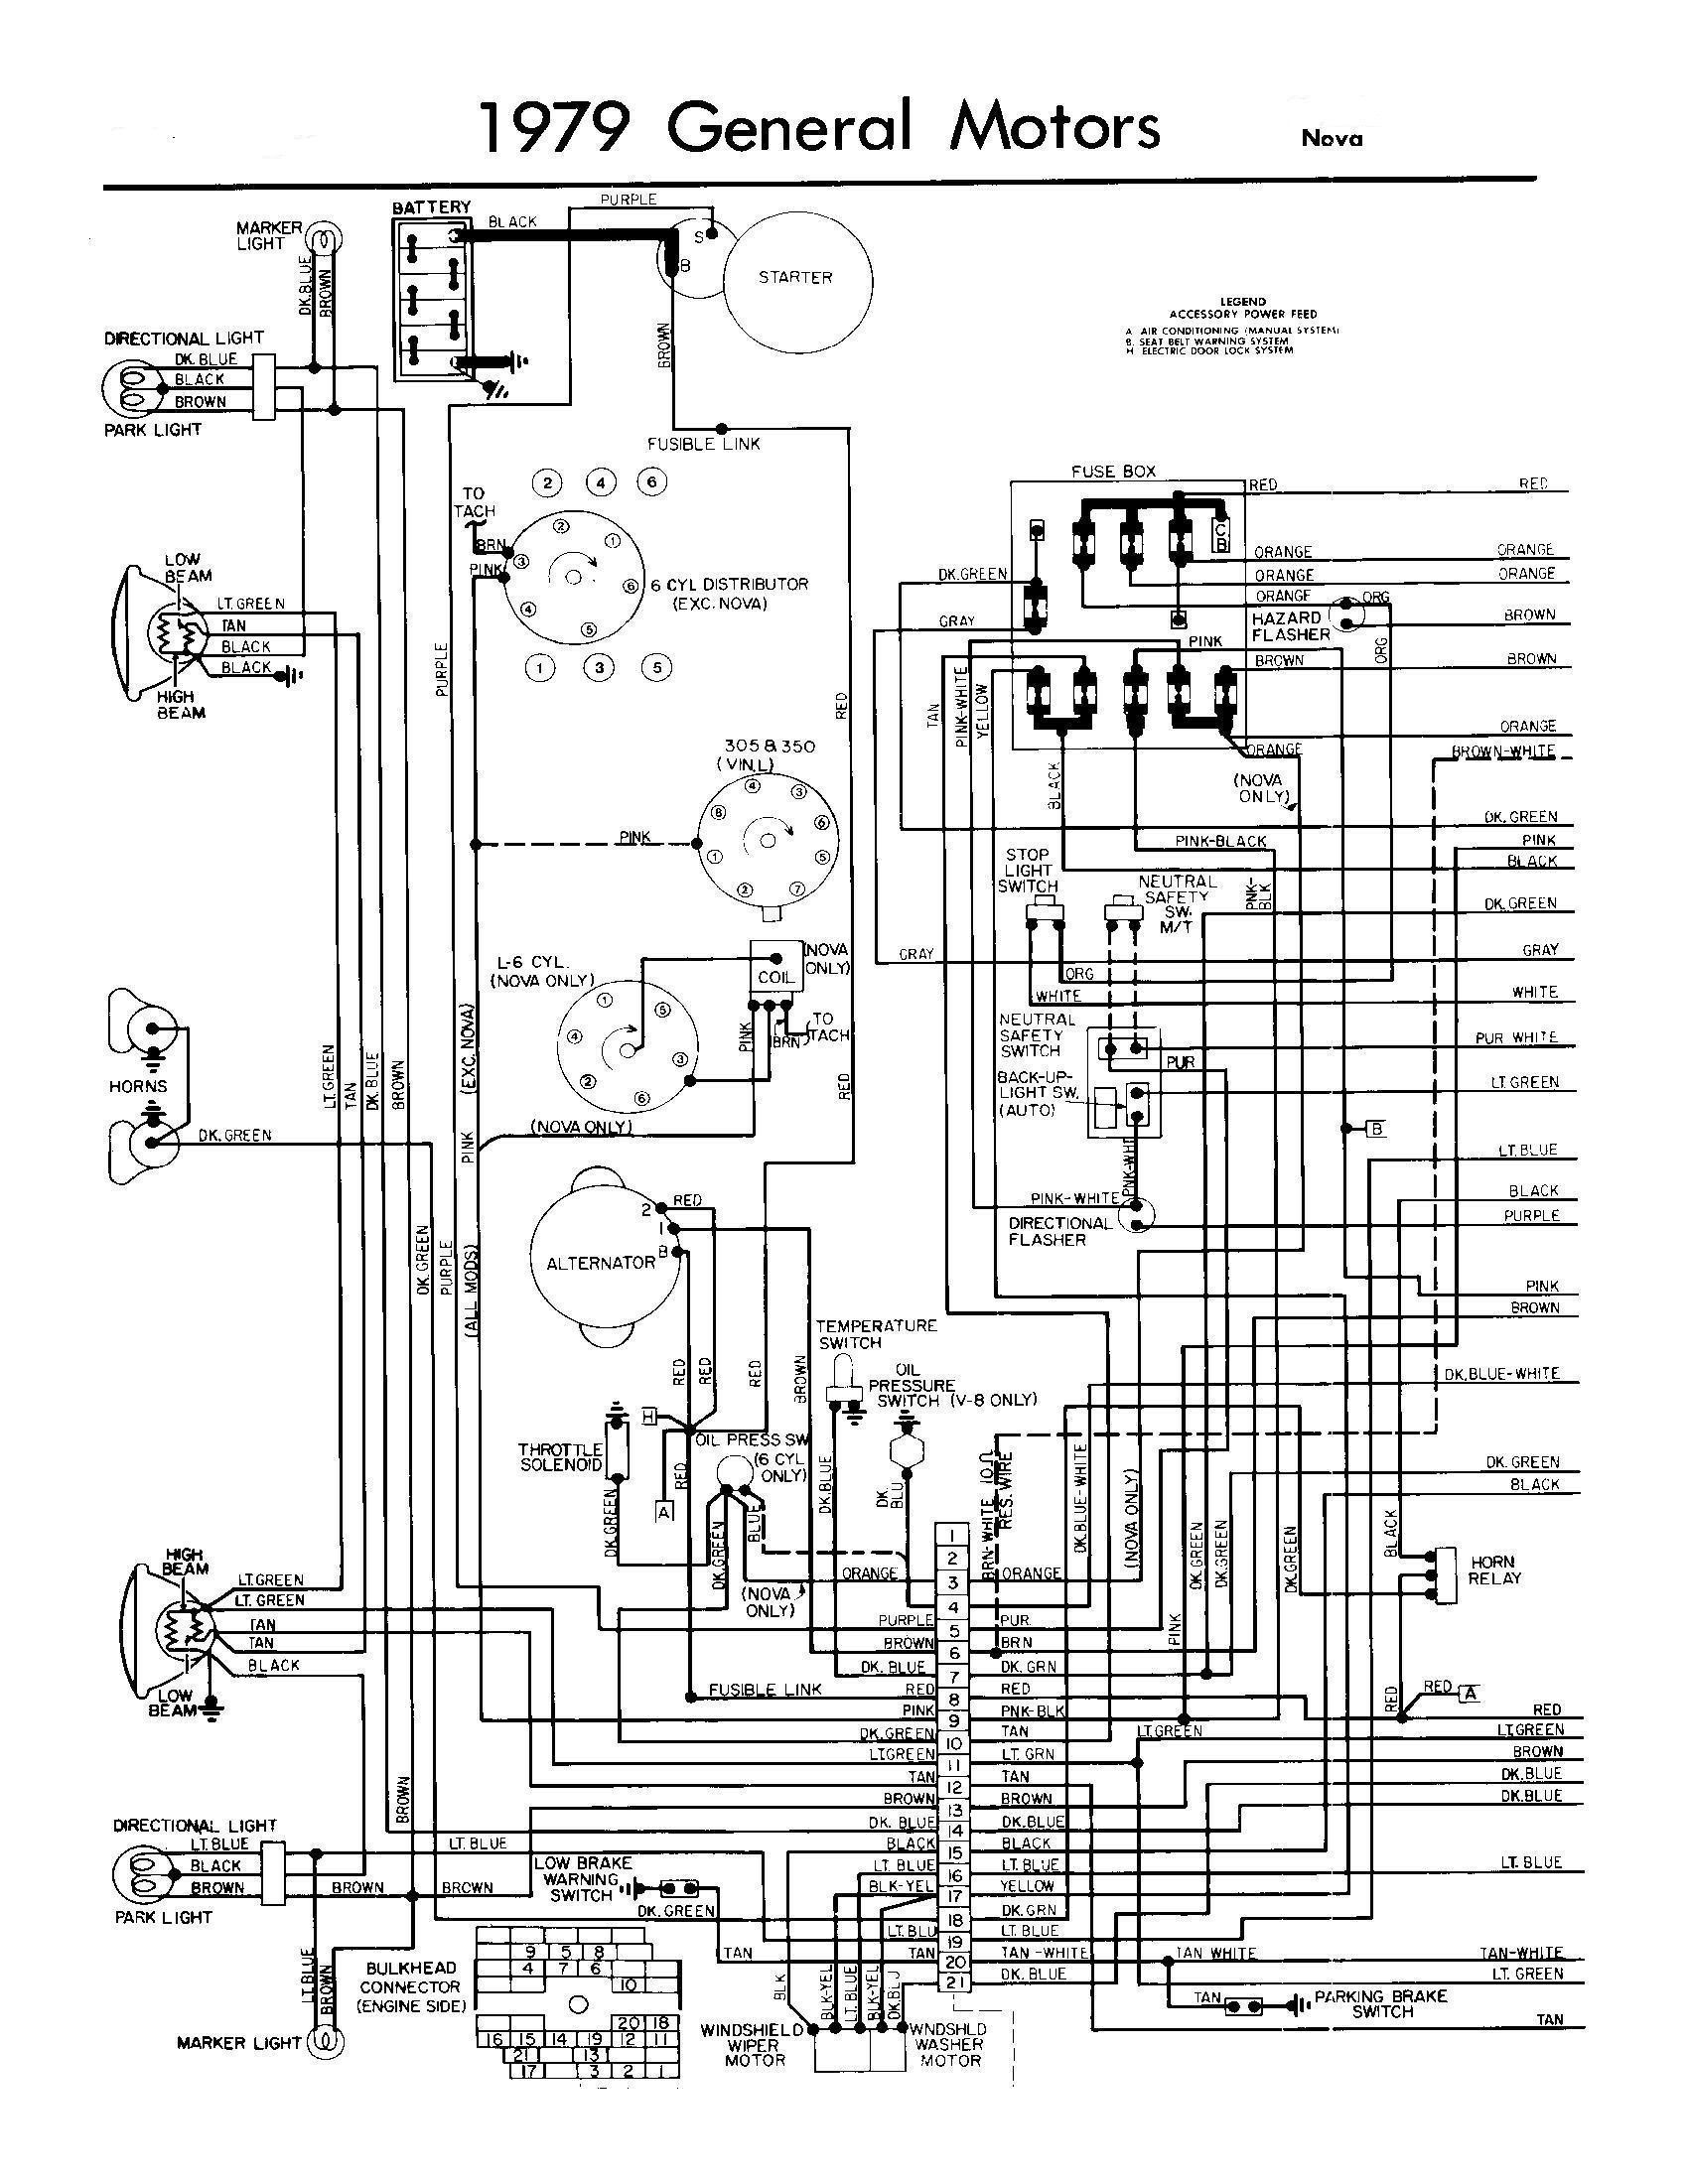 wiring diagram for 1979 toyota corolla - wiring diagram progress-news -  progress-news.valhallarestaurant.it  valhallarestaurant.it